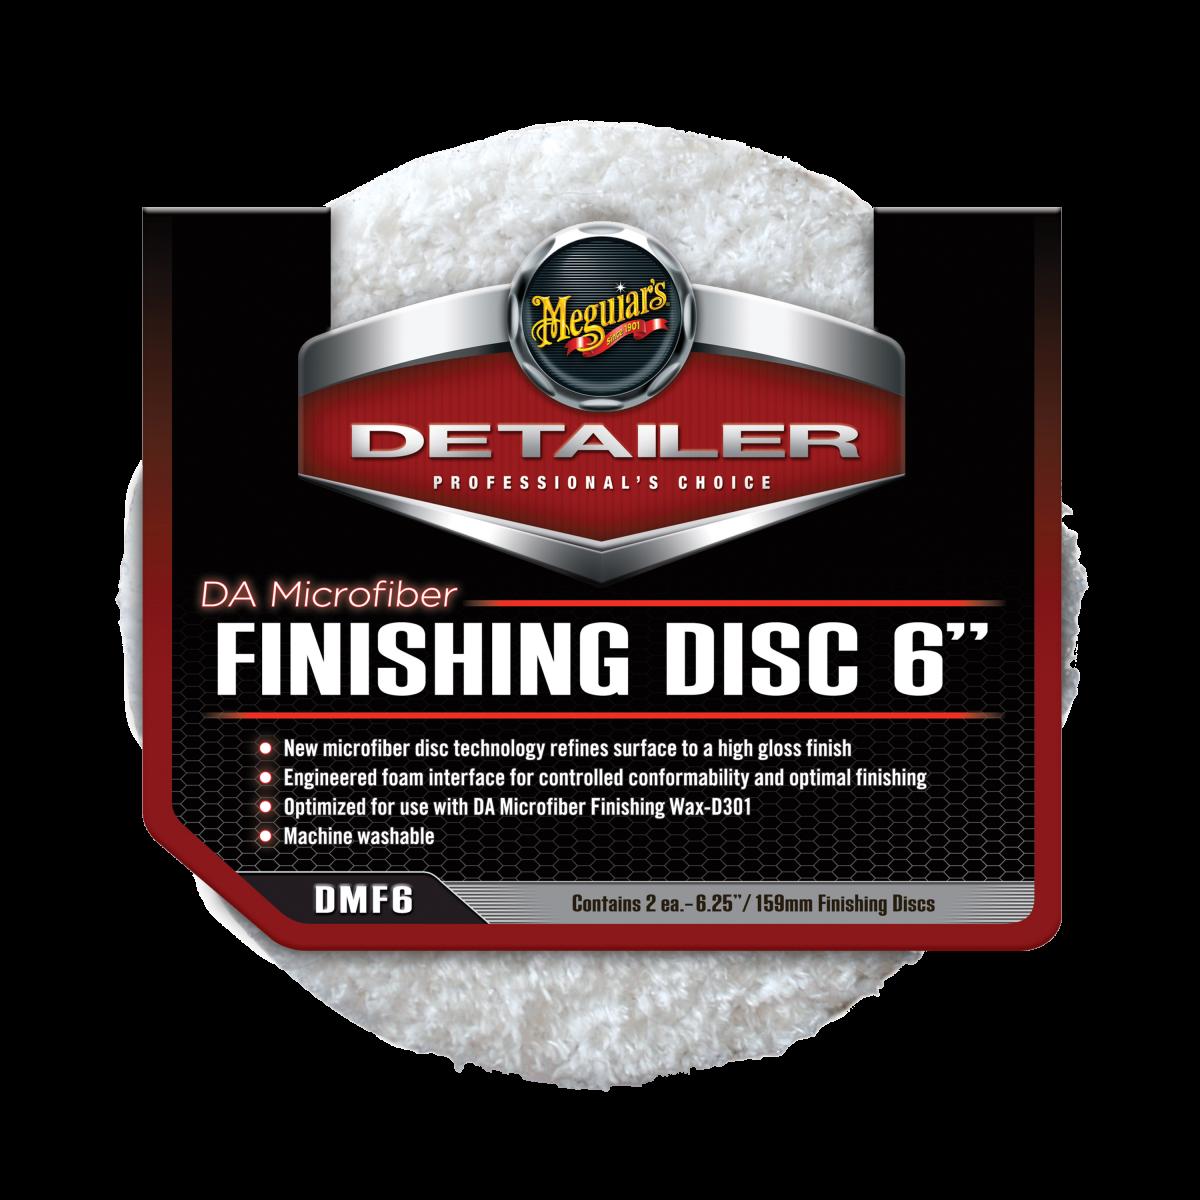 "Meguiar's DA Microfiber Finishing Disc 6"""